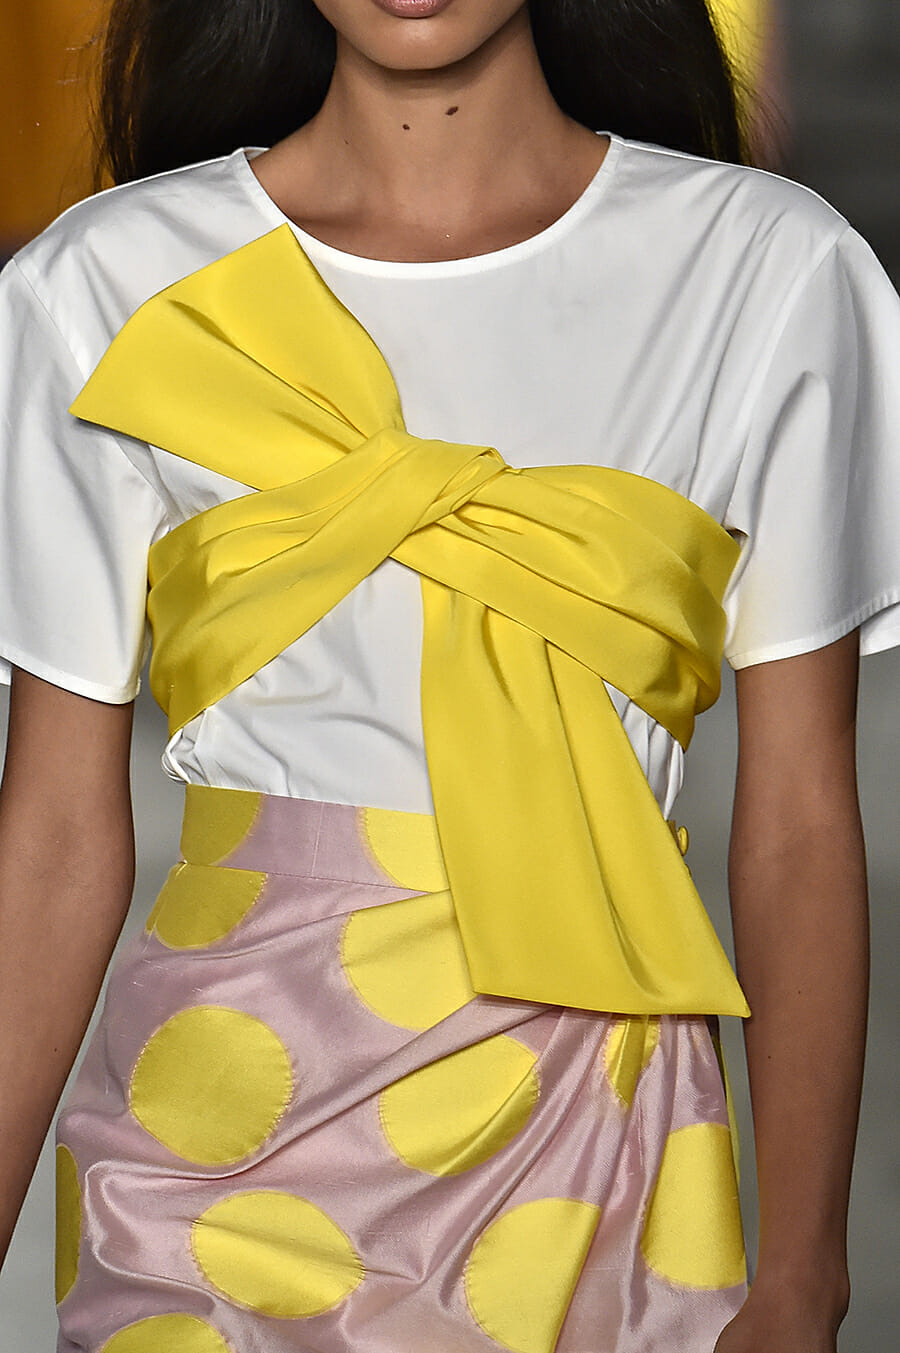 Carolina-Herrera-New-York-Fashion-Week-Spring-Summer-2018-NY-September-2017-look-27-detail-2